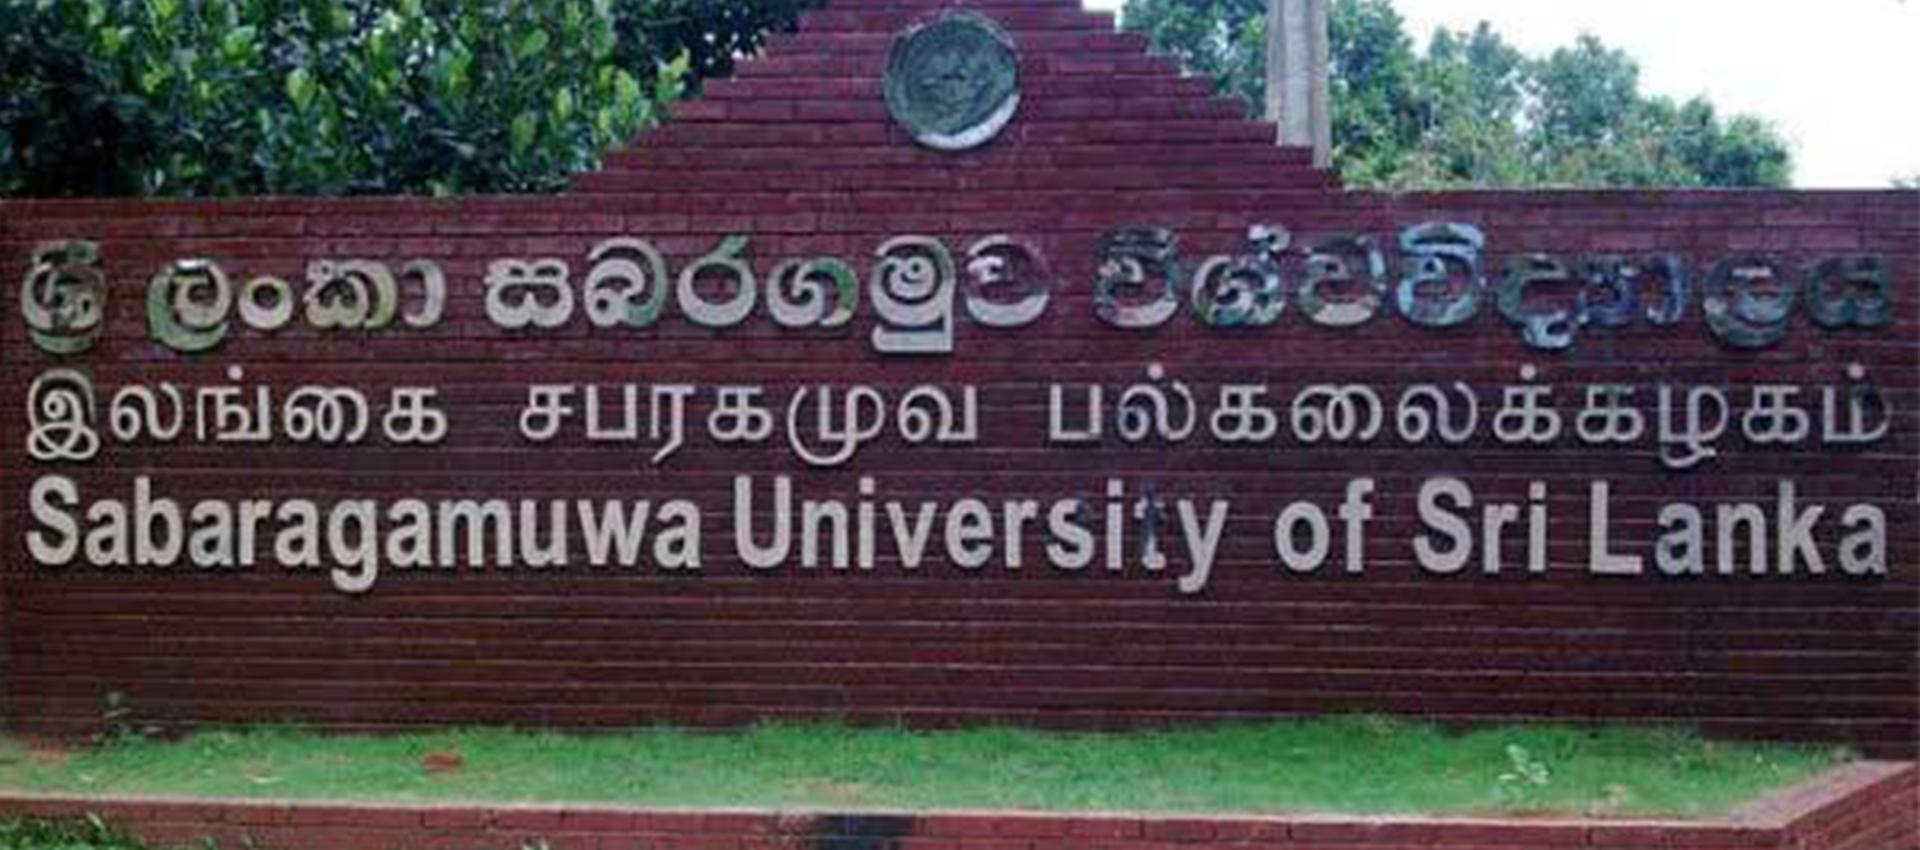 Yesman.lk - Cover Image - Sabaragamuwa University